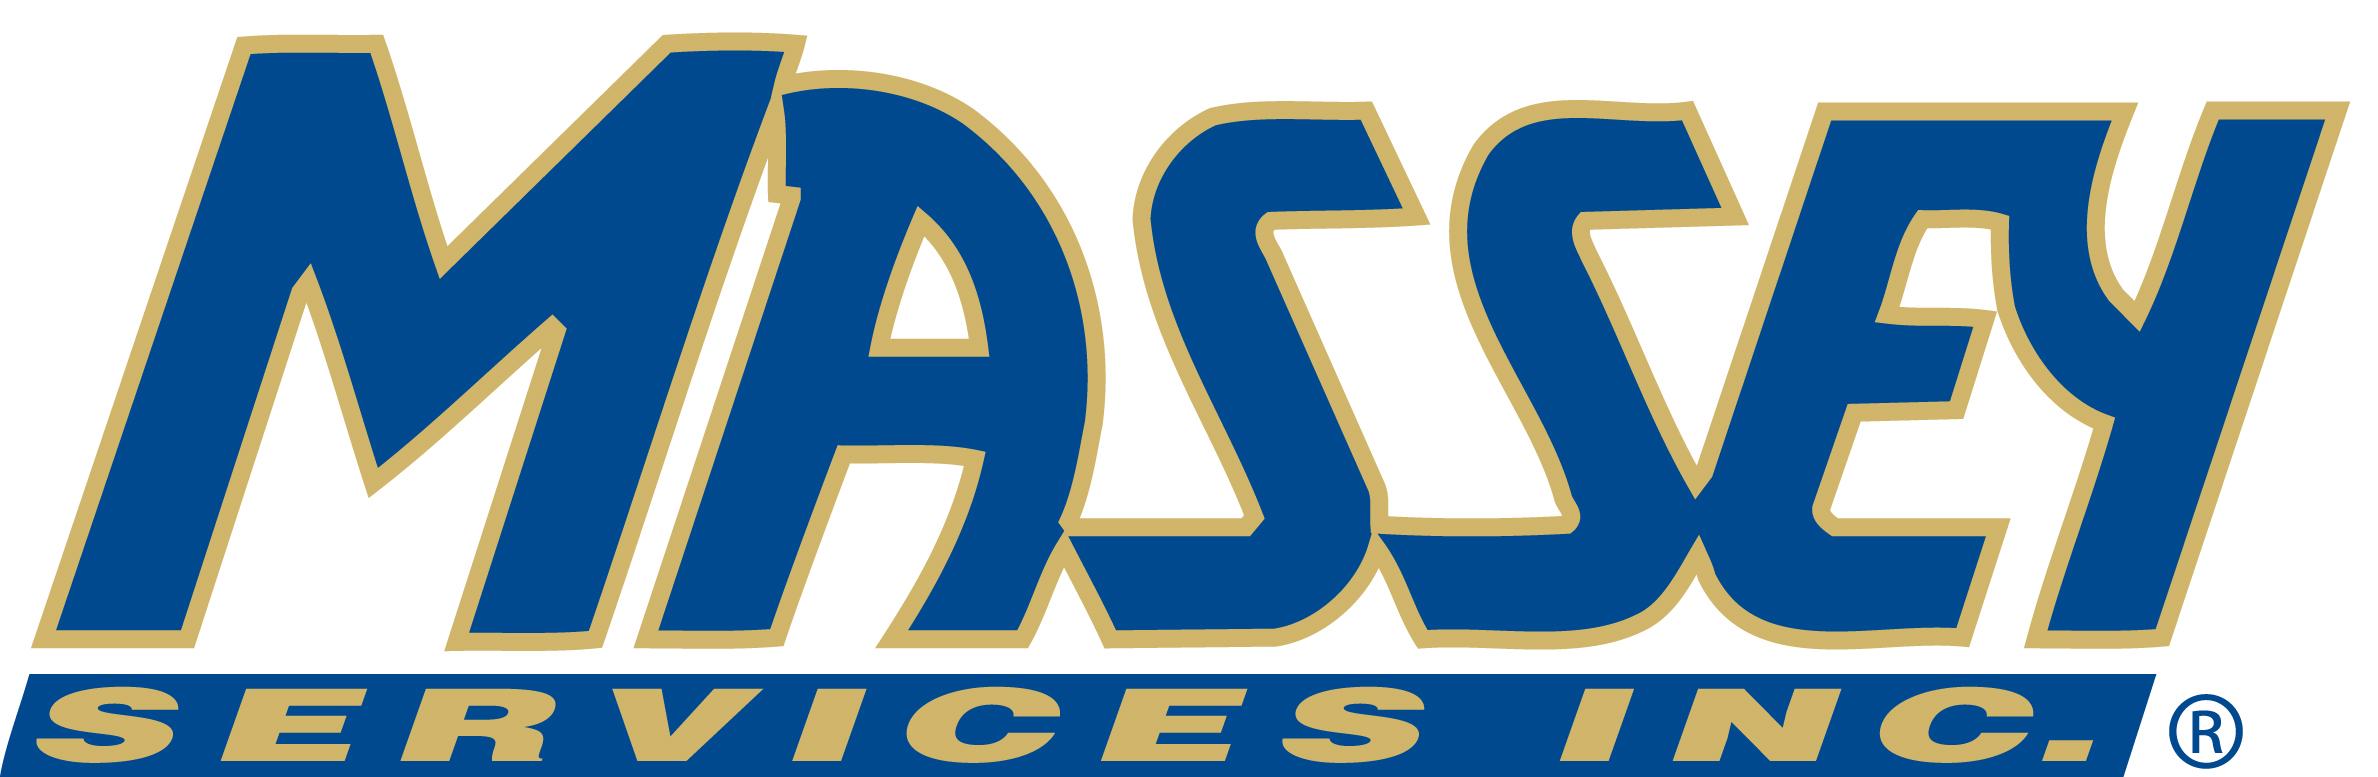 Massey Services Logo